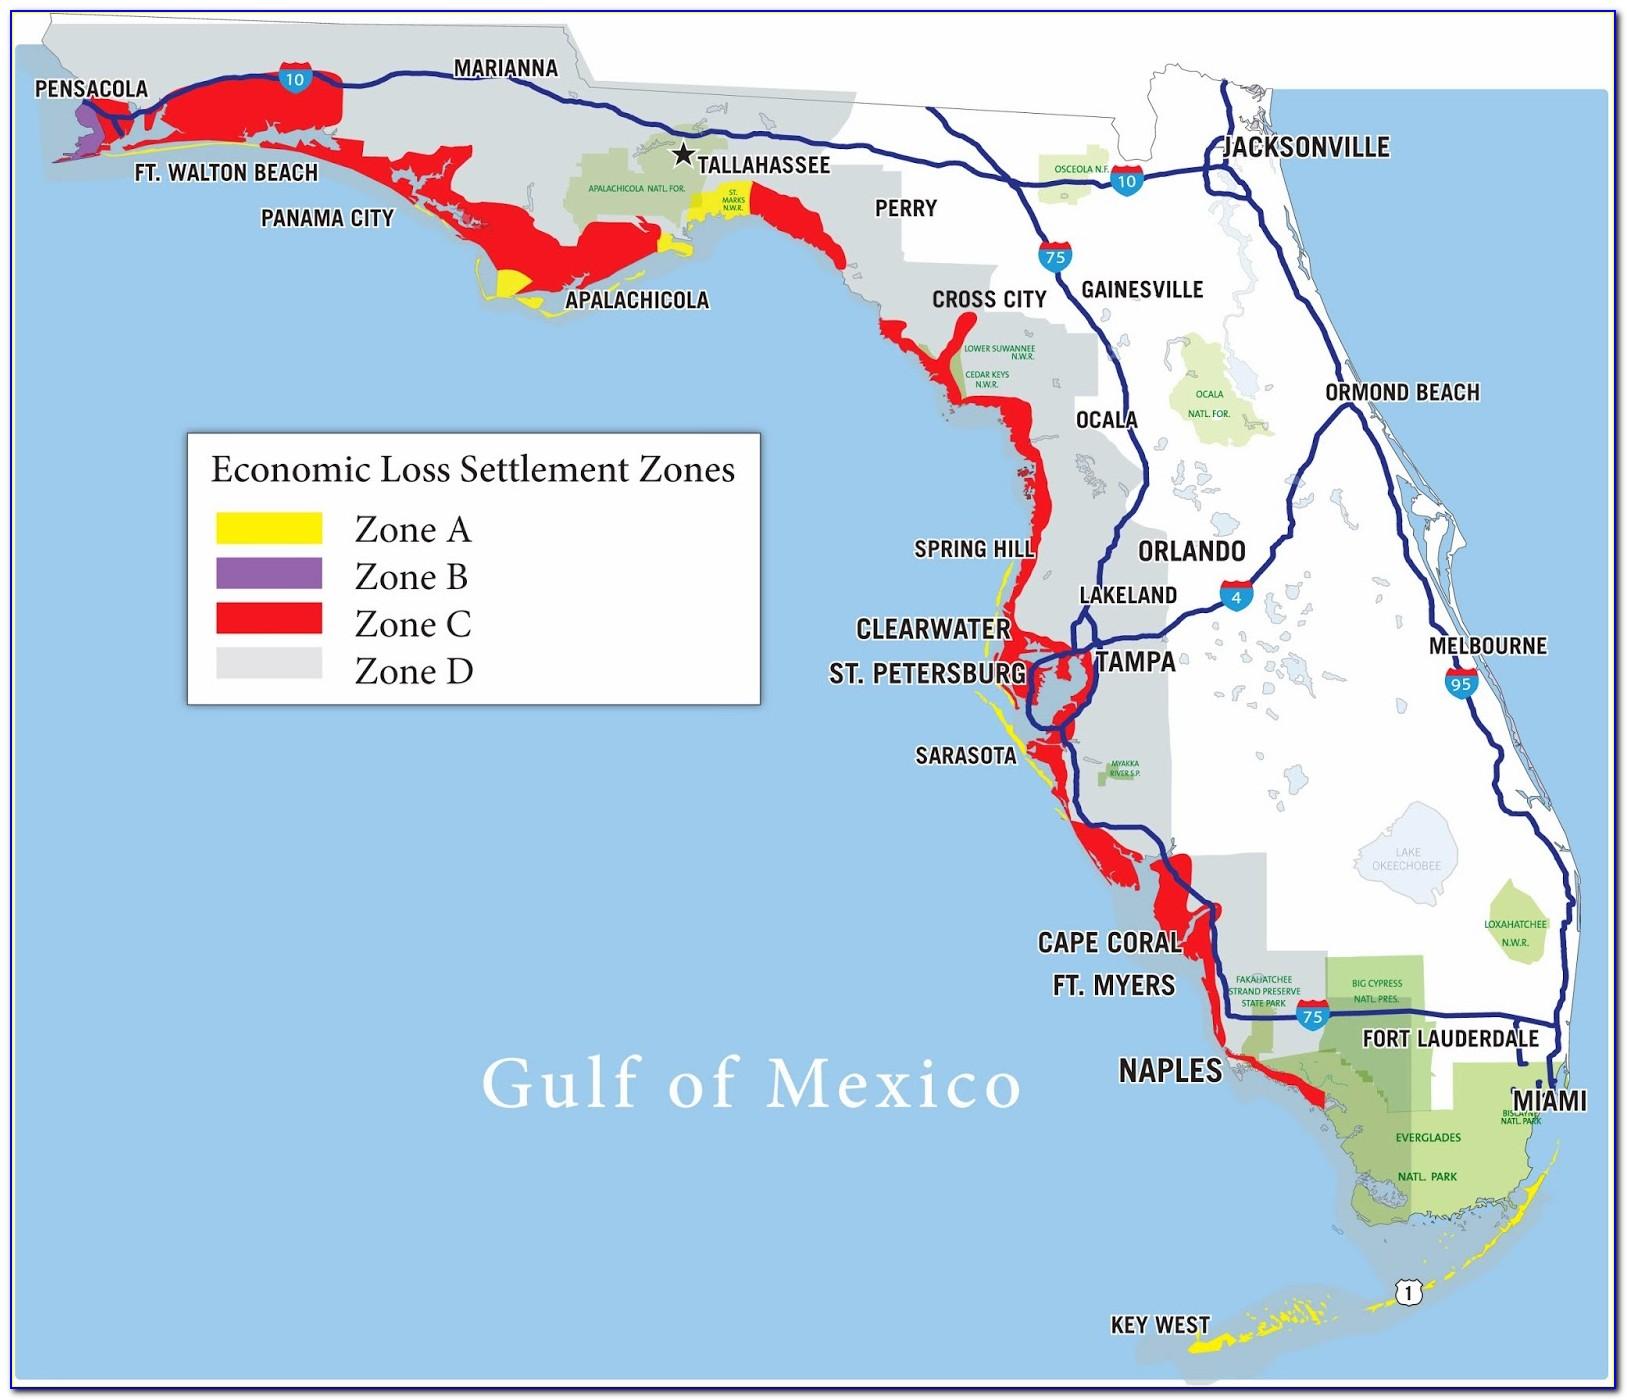 Flood Zone Maps Florida Keys